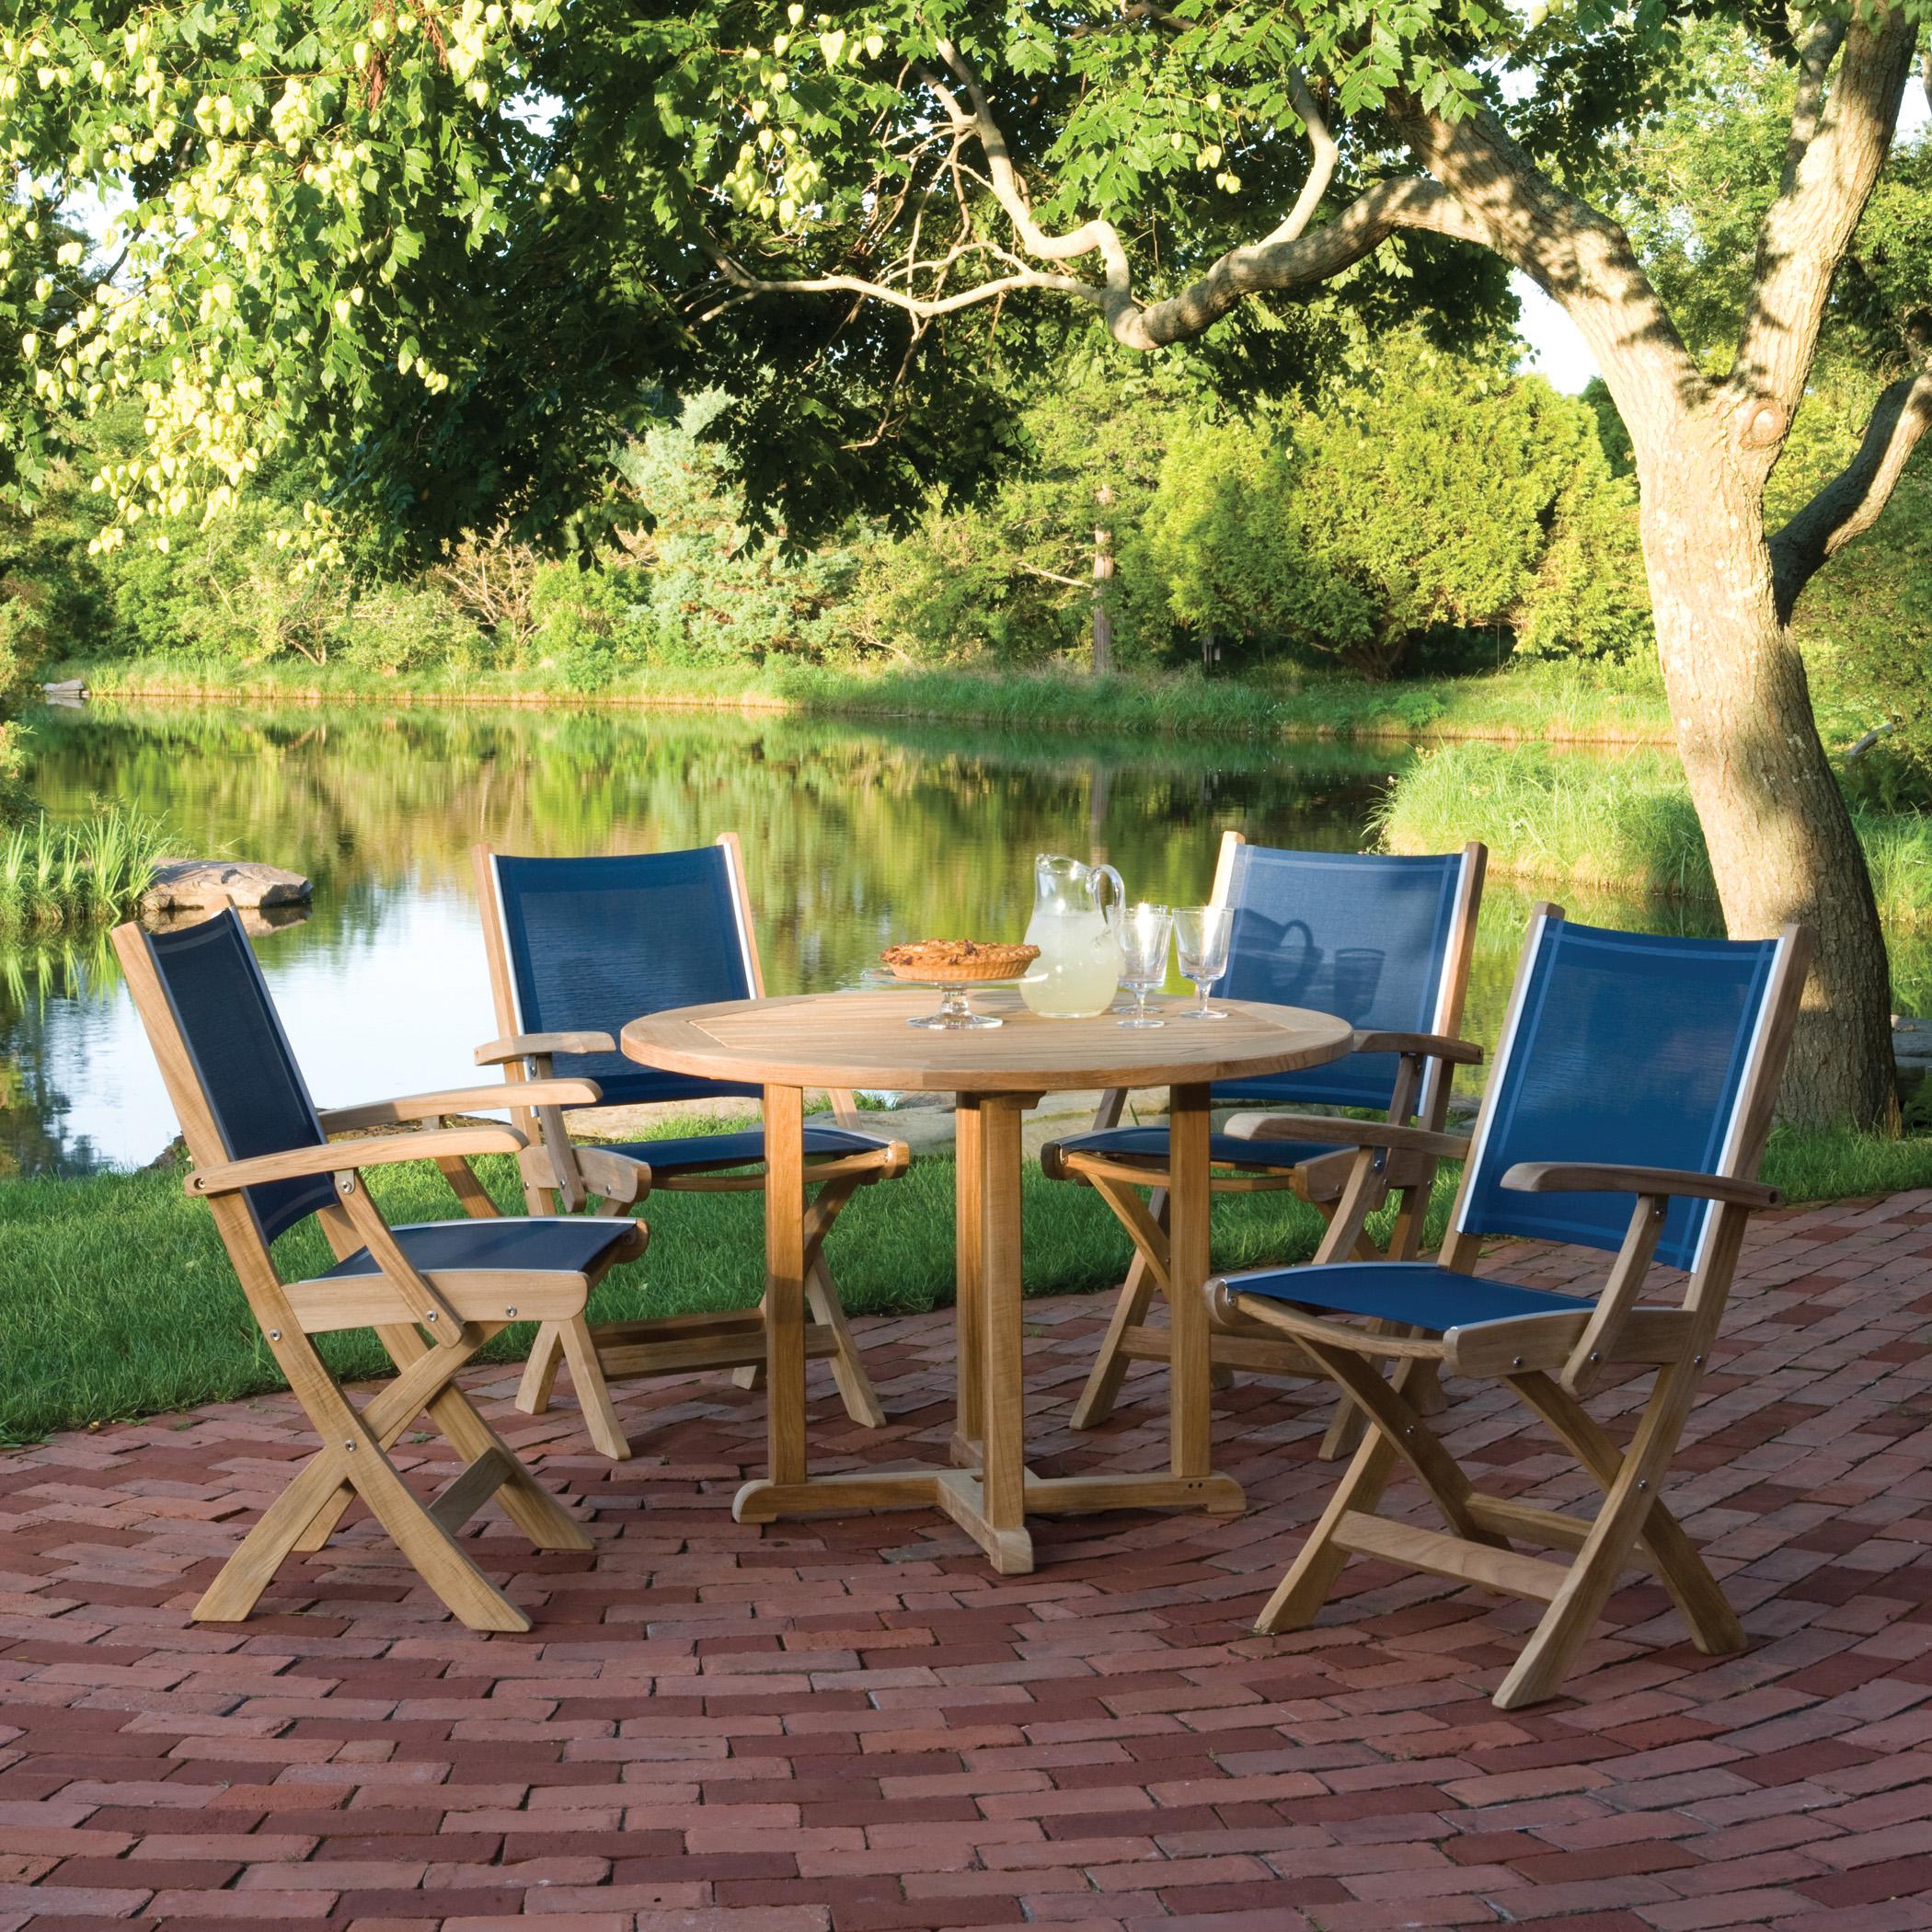 Kingsley-Bate St. Tropez Dining Armchair (Folding)